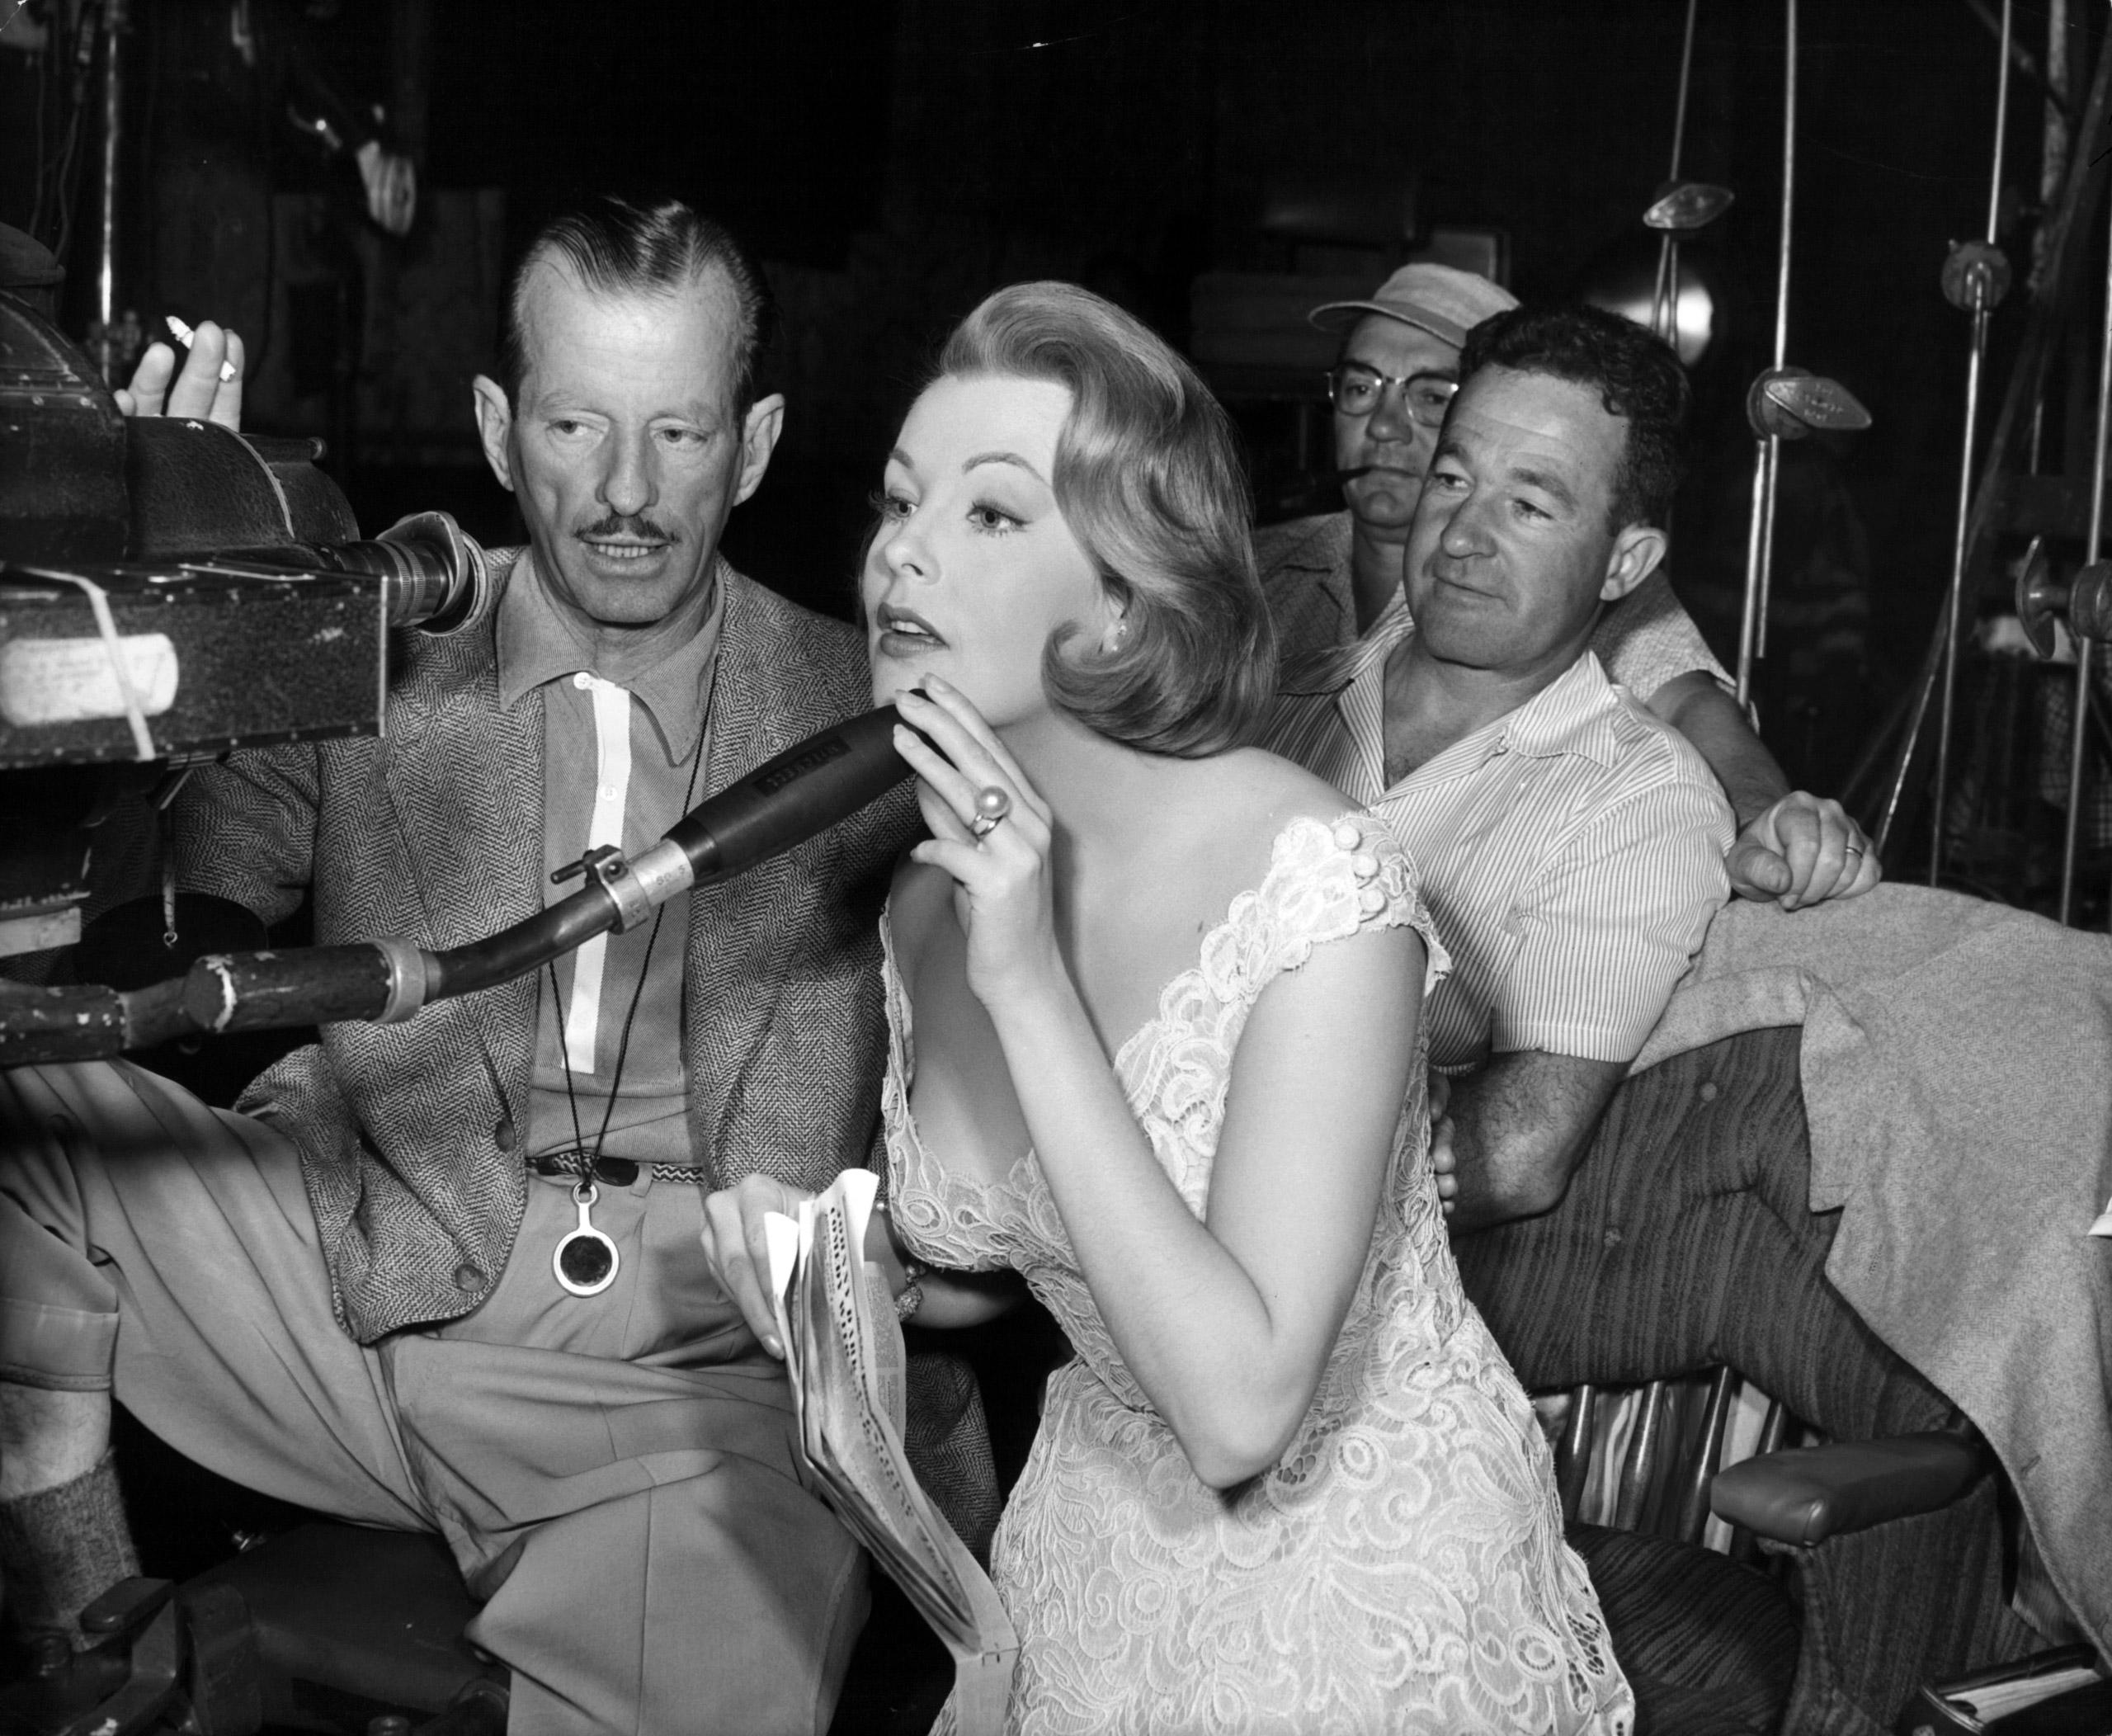 Joseph MacDonald shows Arlene Dahl the mysteries of the CinemaScope Technicolor camera on the set of the film 'Woman's World', 1954.